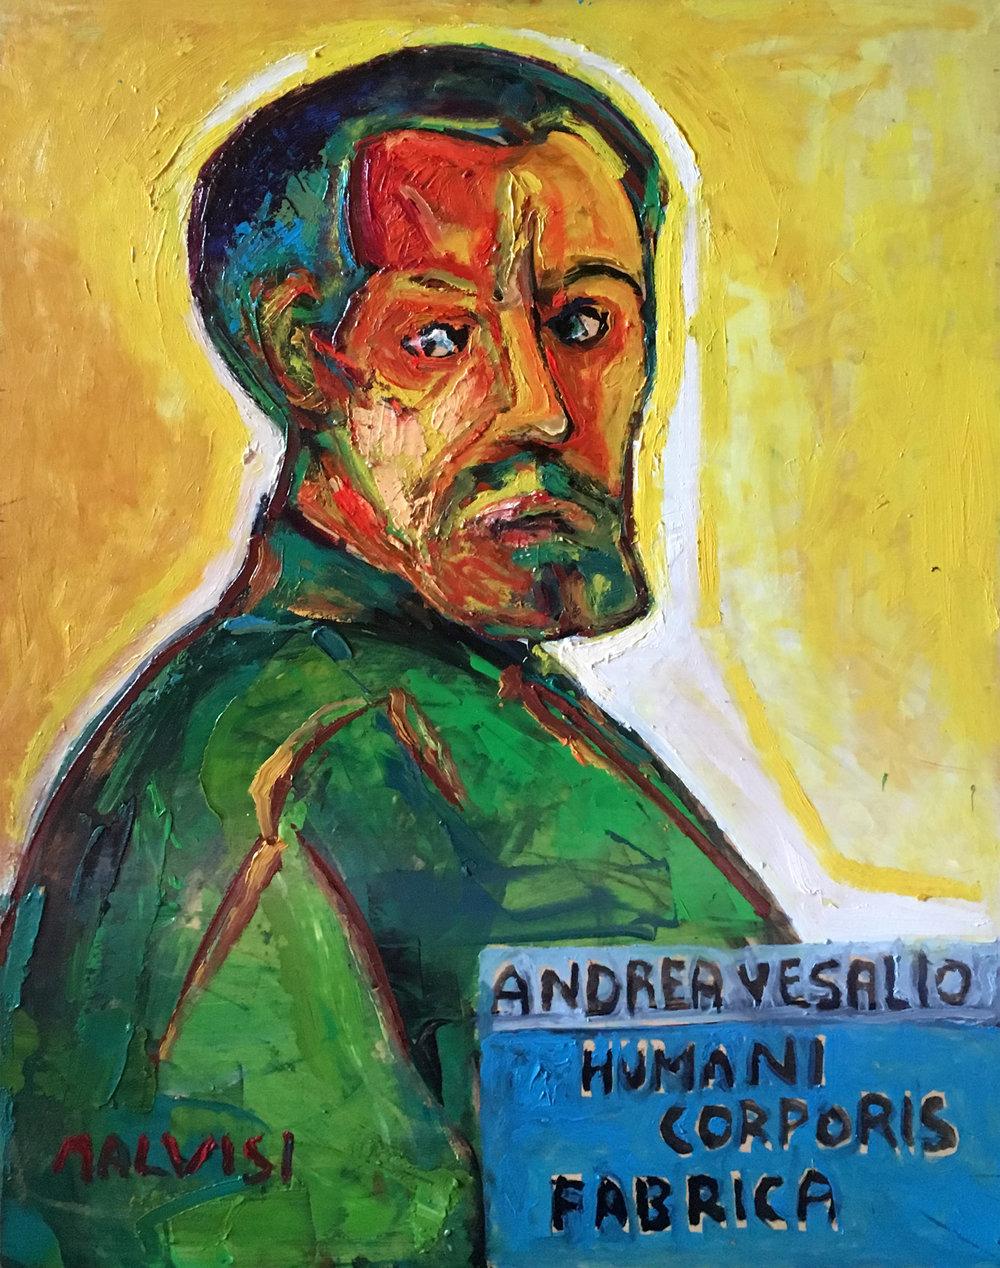 <b>Adrea Versalio</b><br> 2000 Oil on wood <br> cm 50 x 70